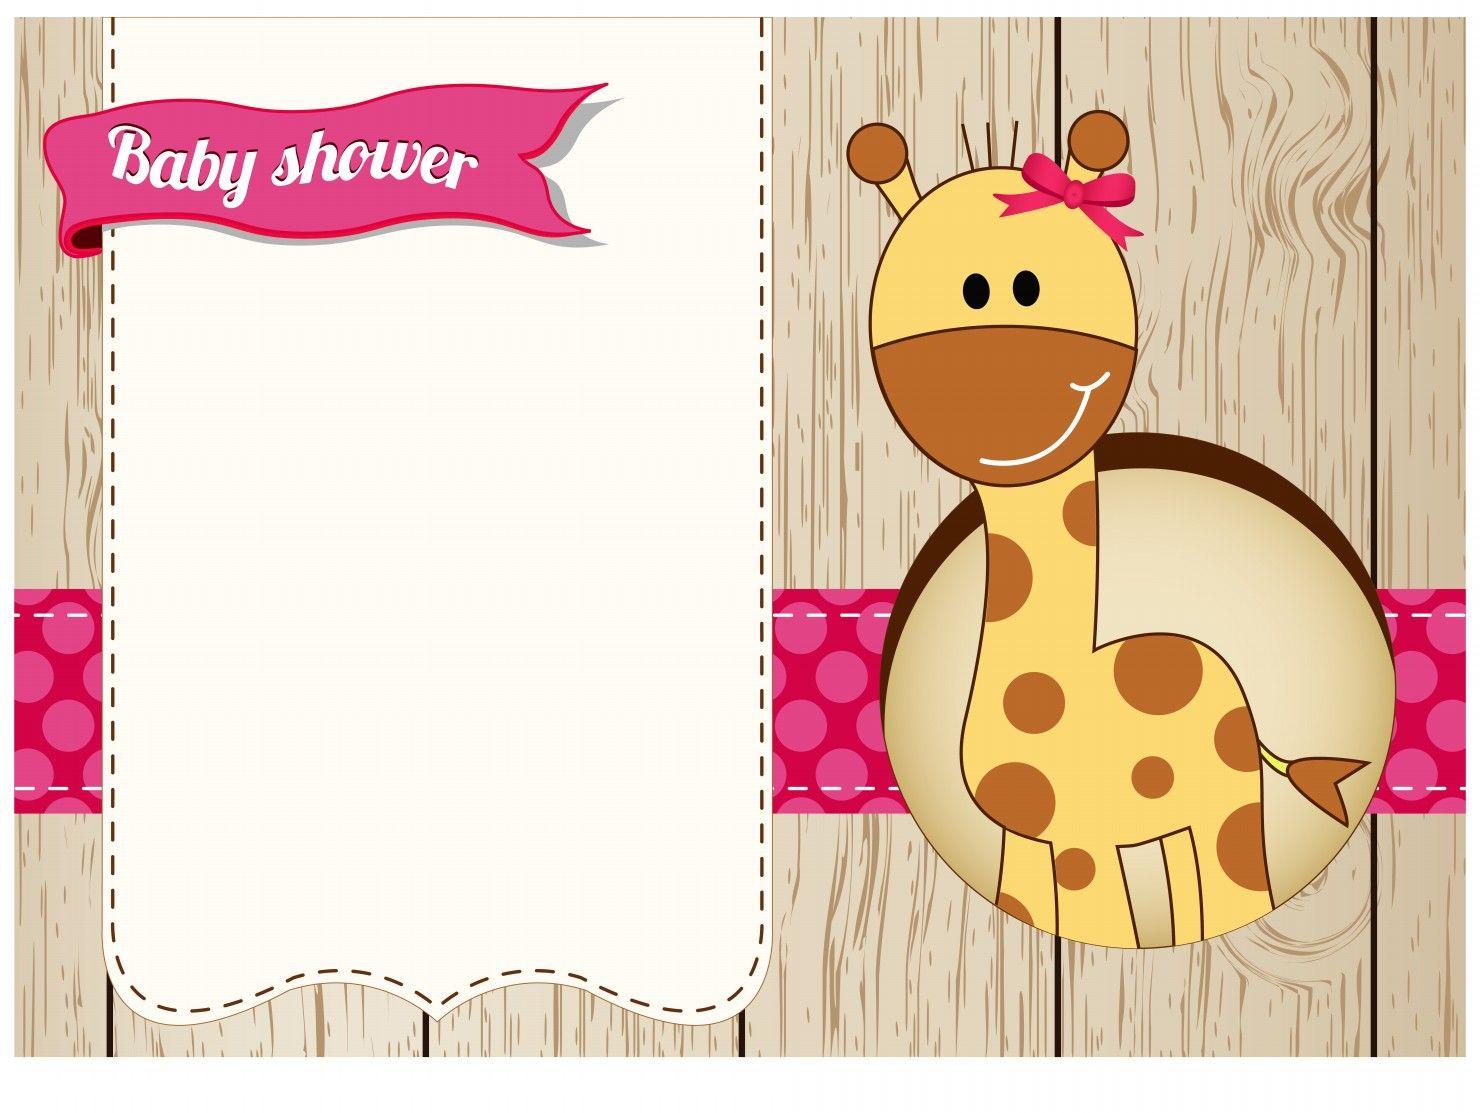 Baby shower giraffe girl card | B Shower | Pinterest | Giraffe baby ...